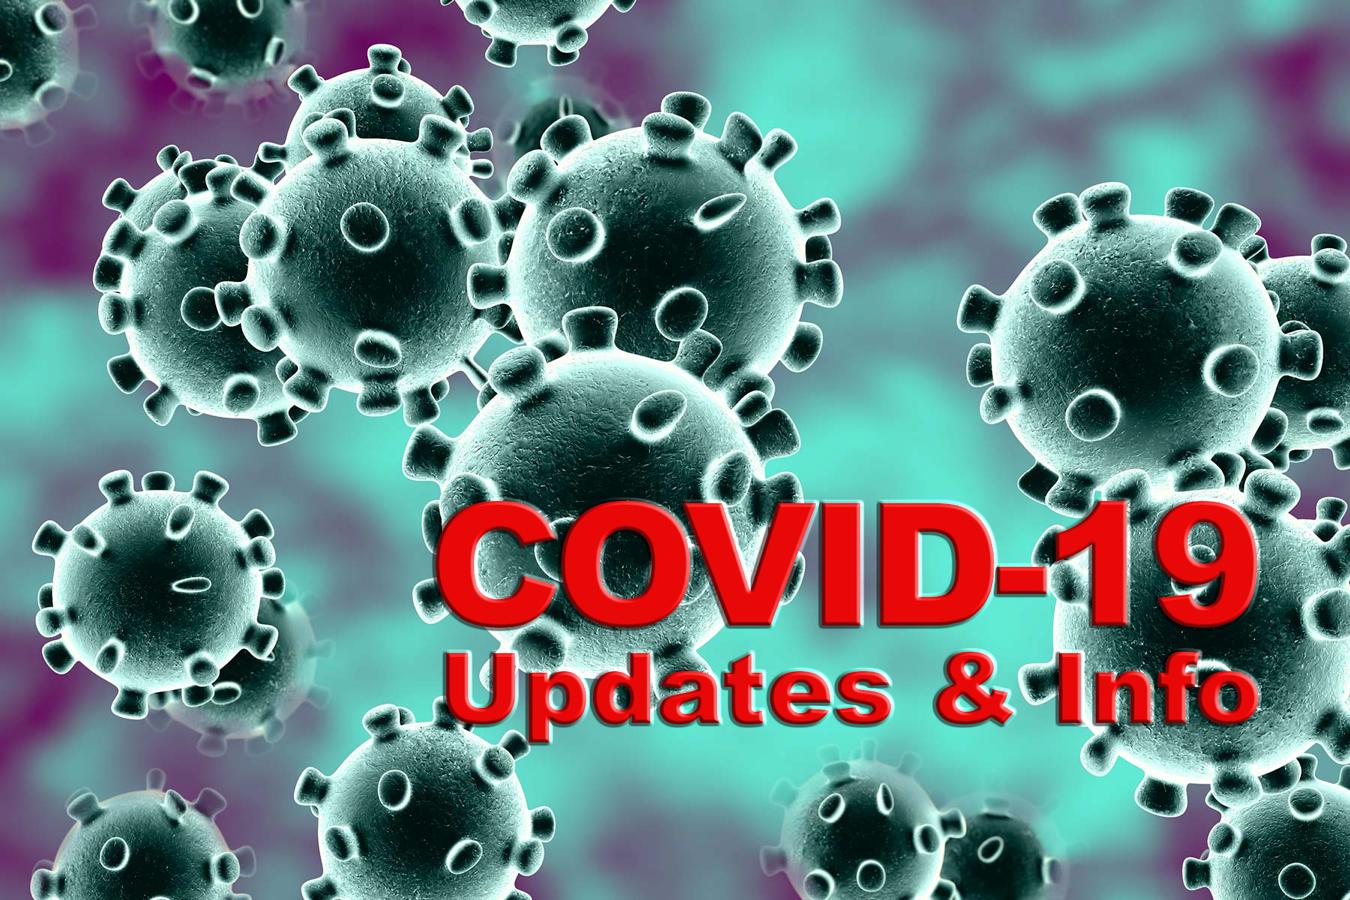 COVID-19 Update Informaton